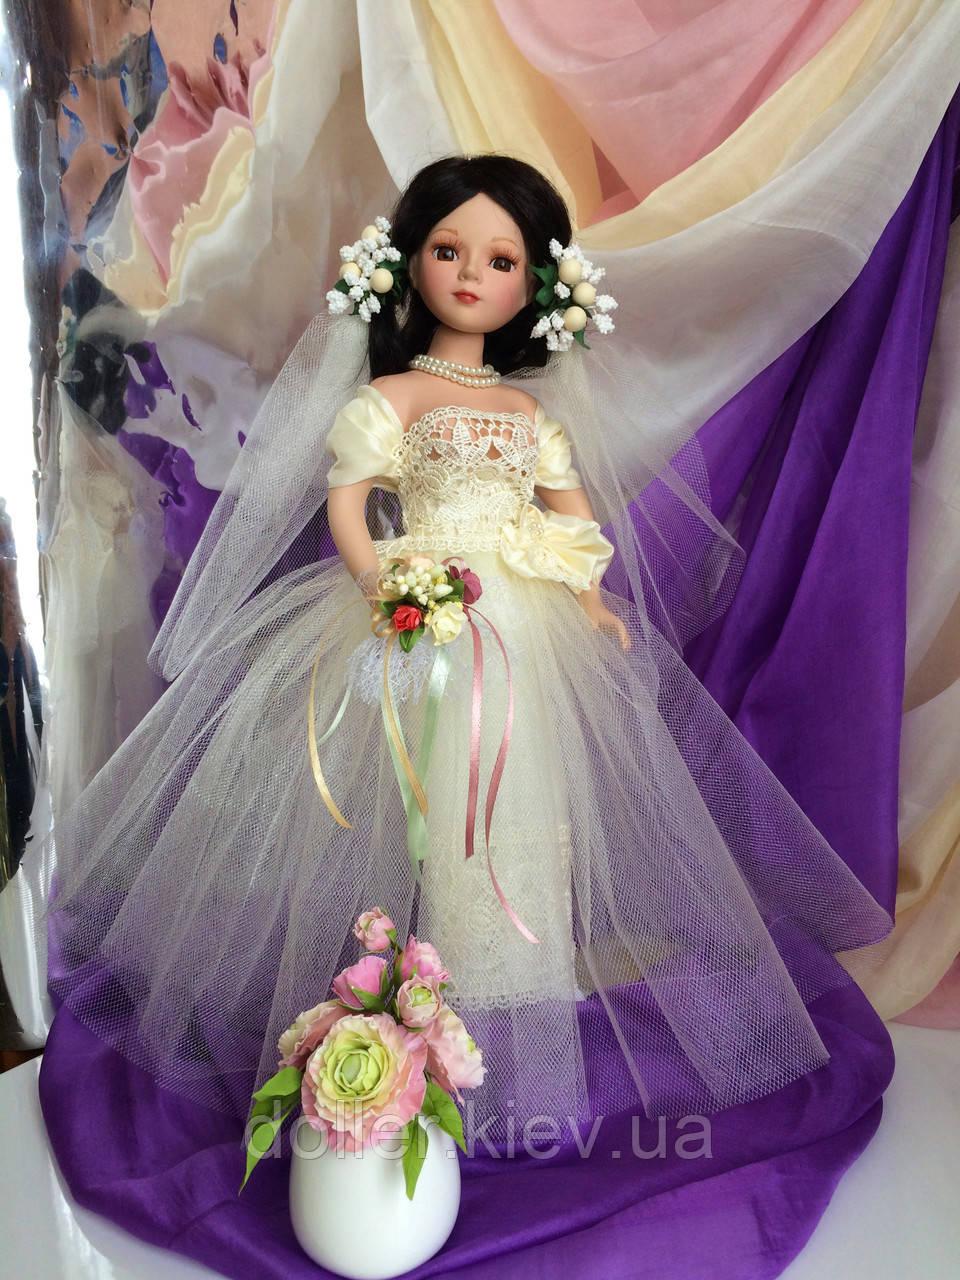 Кукла невеста Арлена (40 см.) фарфоровая